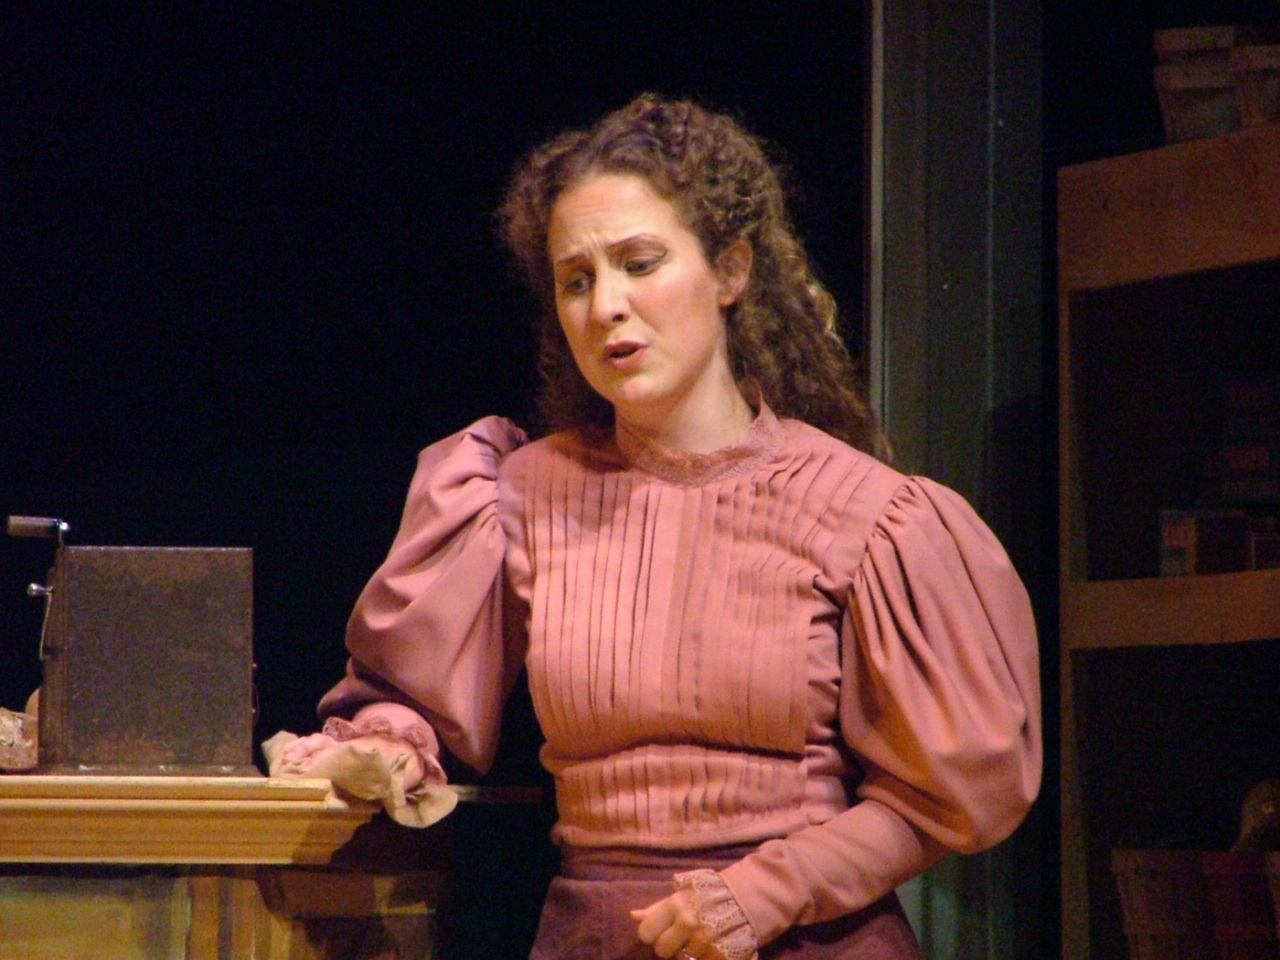 Nancy (Albert Herring) at the University of North Texas